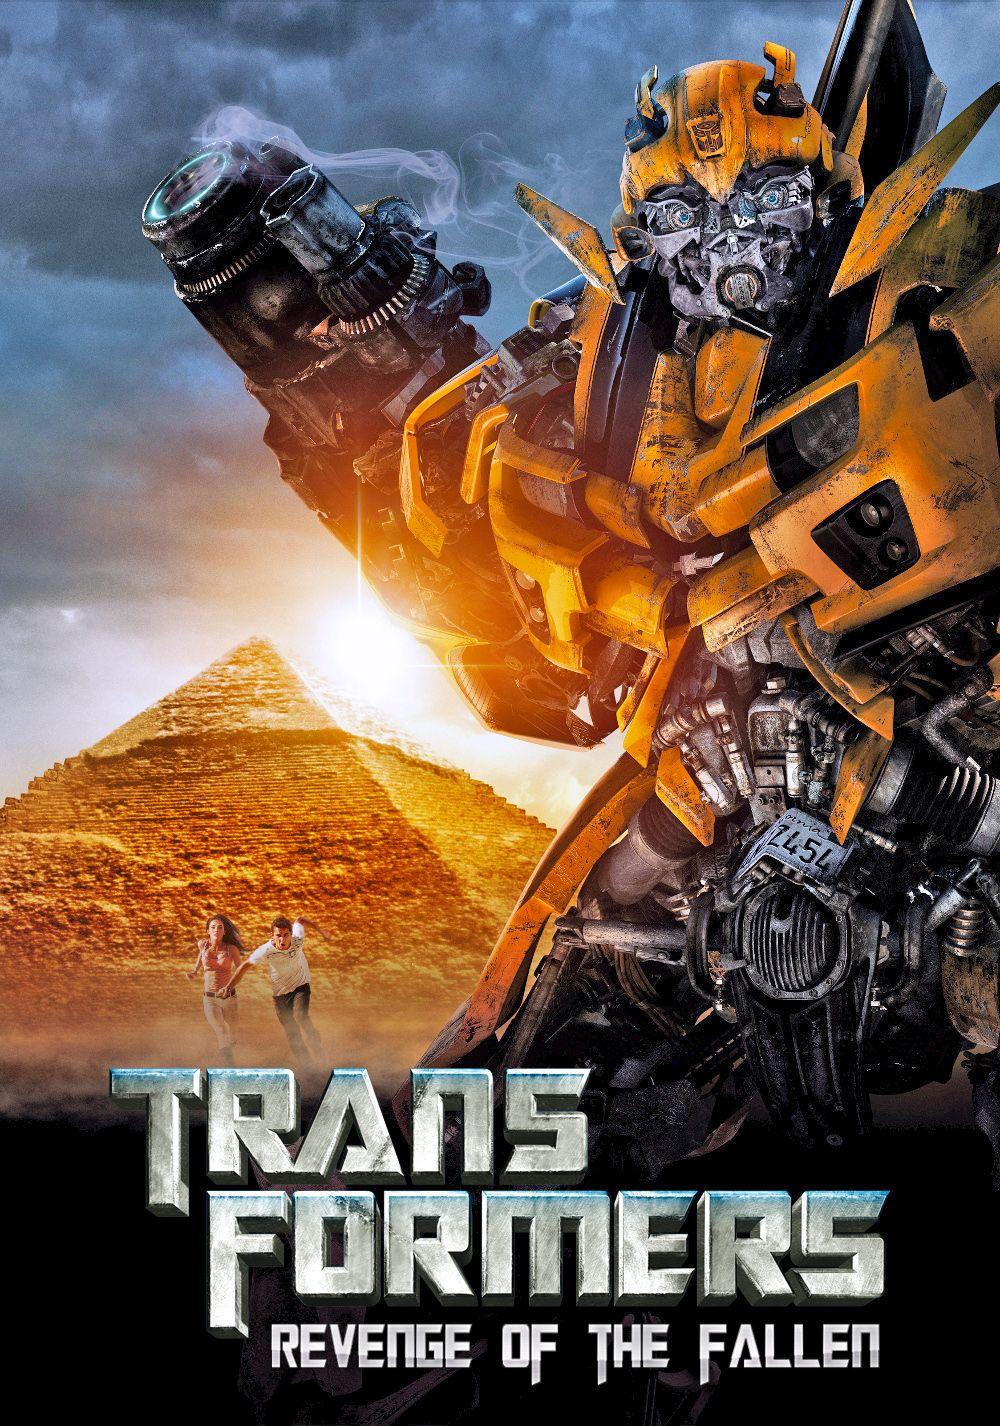 Playtamildub Transformers 2 Revenge Of The Fallen 2009 Tamil Revenge Of The Fallen Revenge Transformers